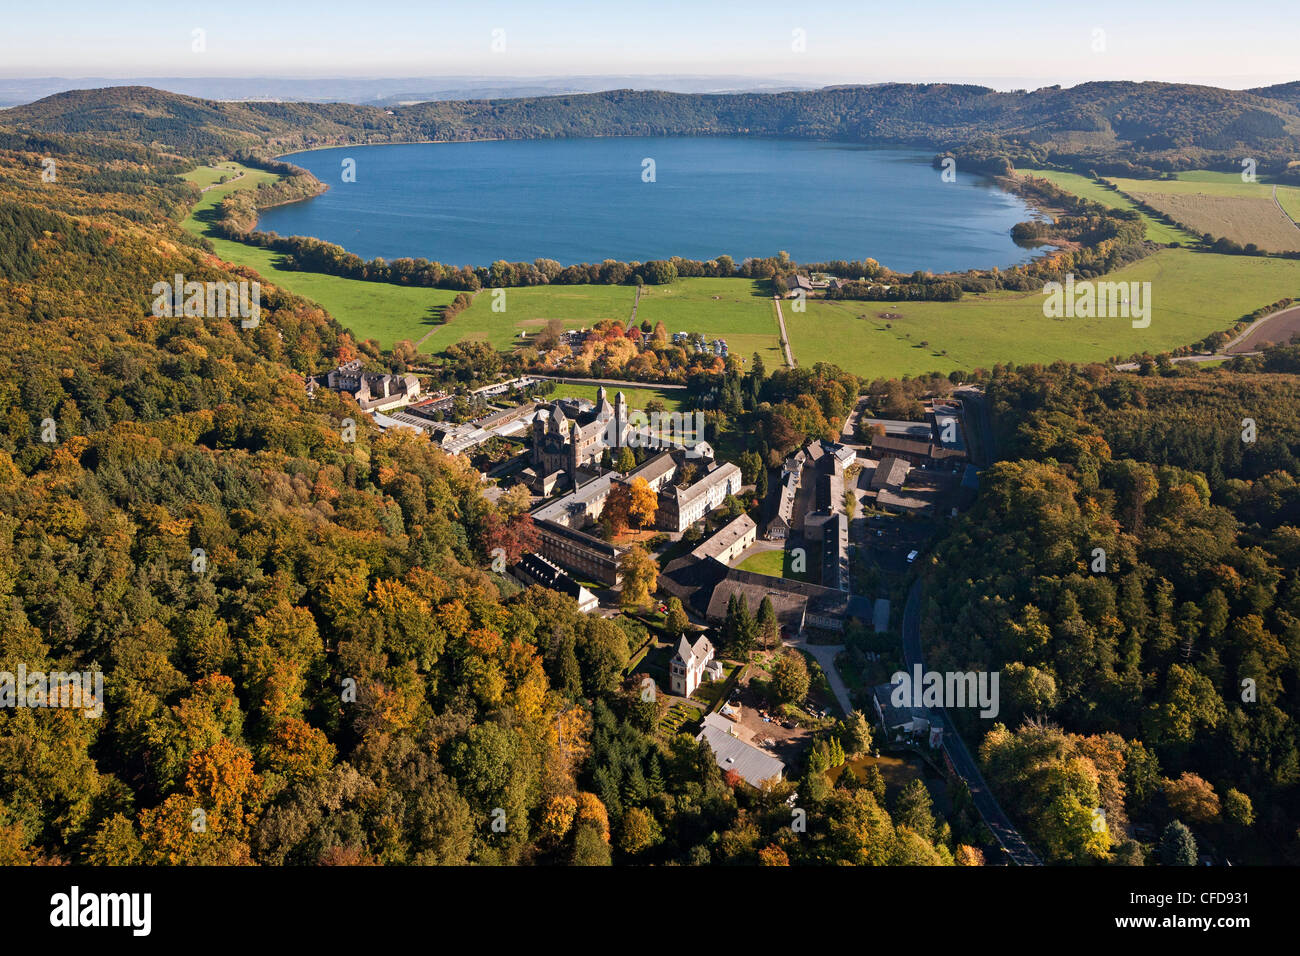 Vue aérienne de l'abbaye bénédictine au lac de Laach, Maria Laach Abbaye, Eifel, Rhénanie Photo Stock